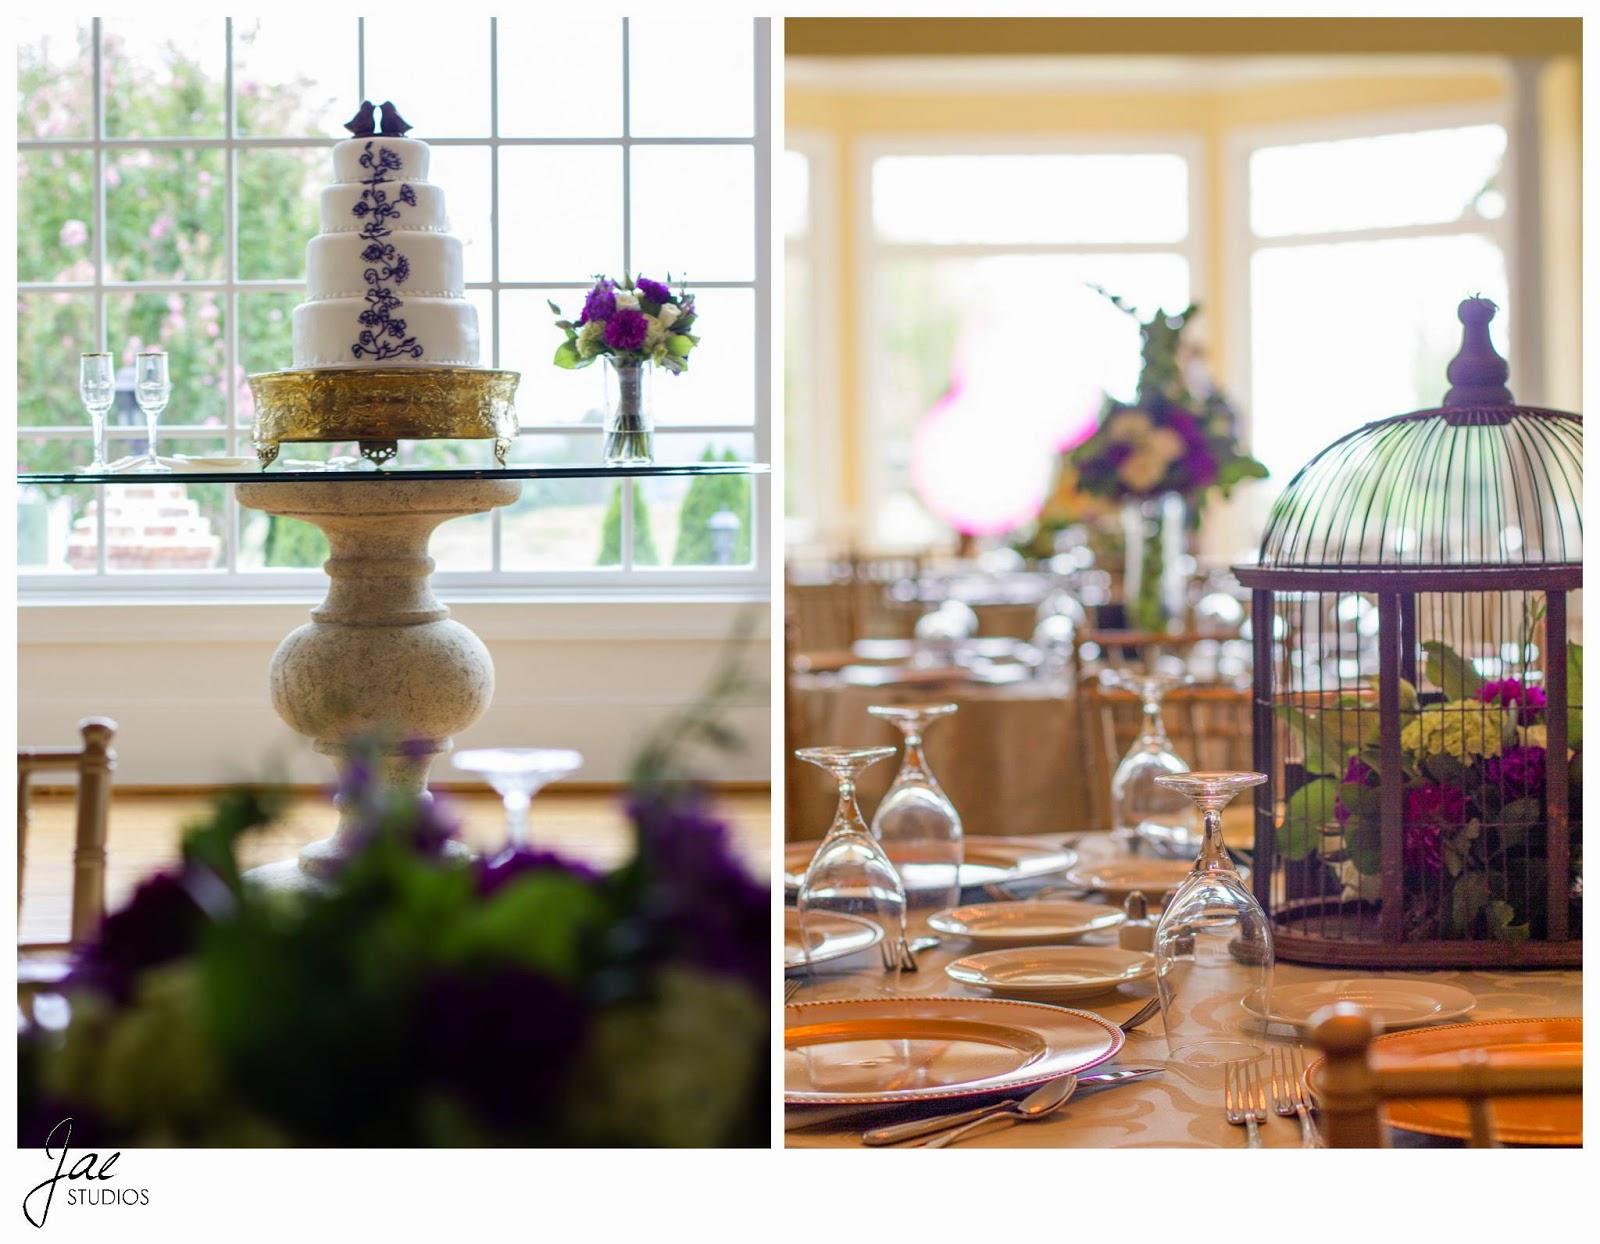 Jonathan and Julie, Bird cage, West Manor Estate, Wedding, Lynchburg, Virginia, Jae Studios, cake, bird, chocolate, blue flowers, gold, white, purple flowers, bird cage, window, glass, table